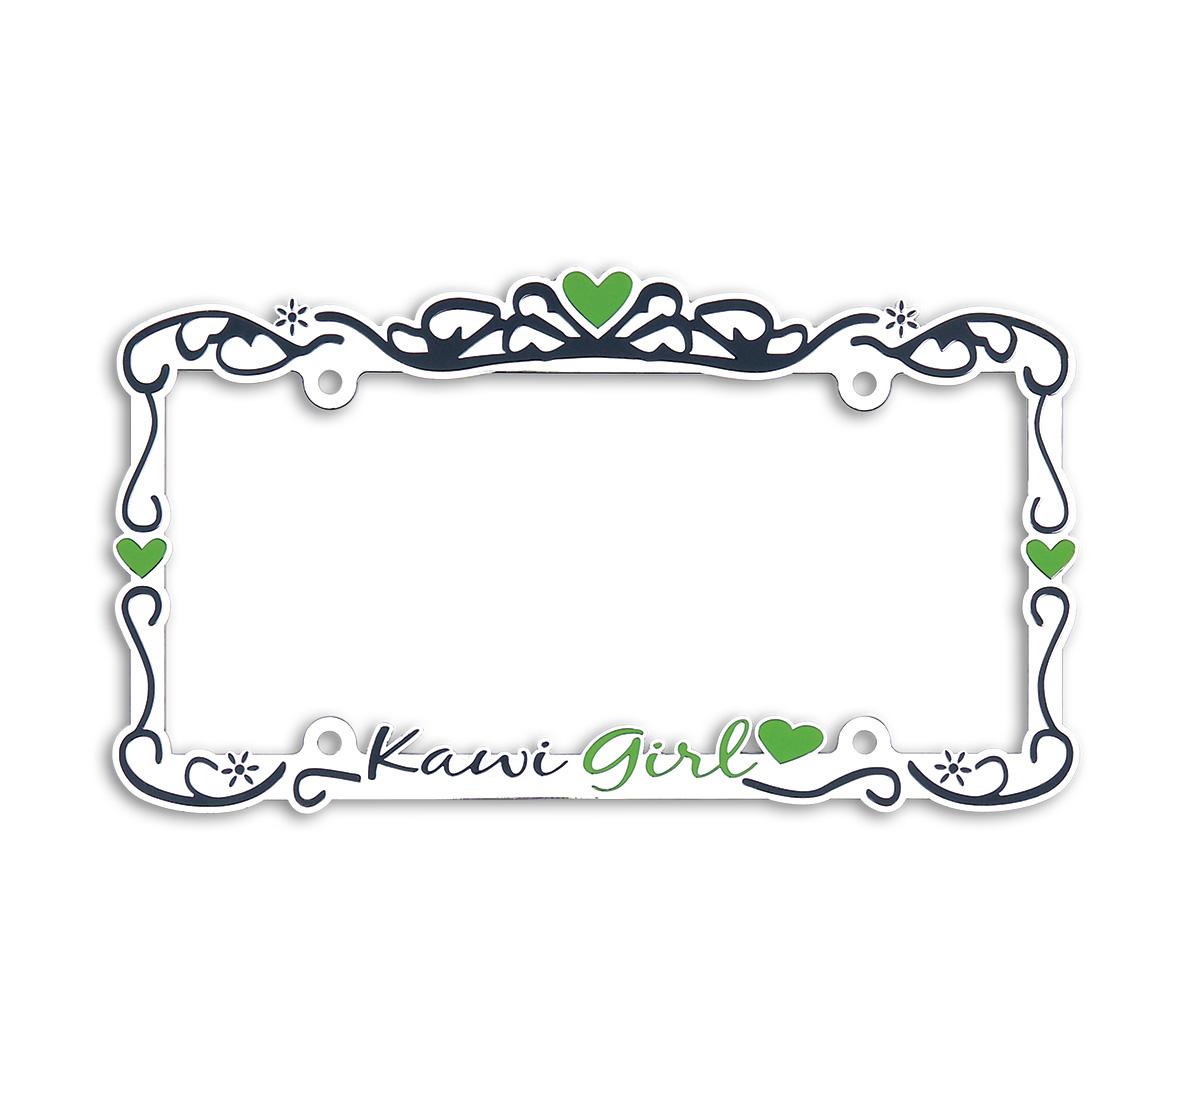 Kawi Girl Metal Chrome Auto License Plate Frame